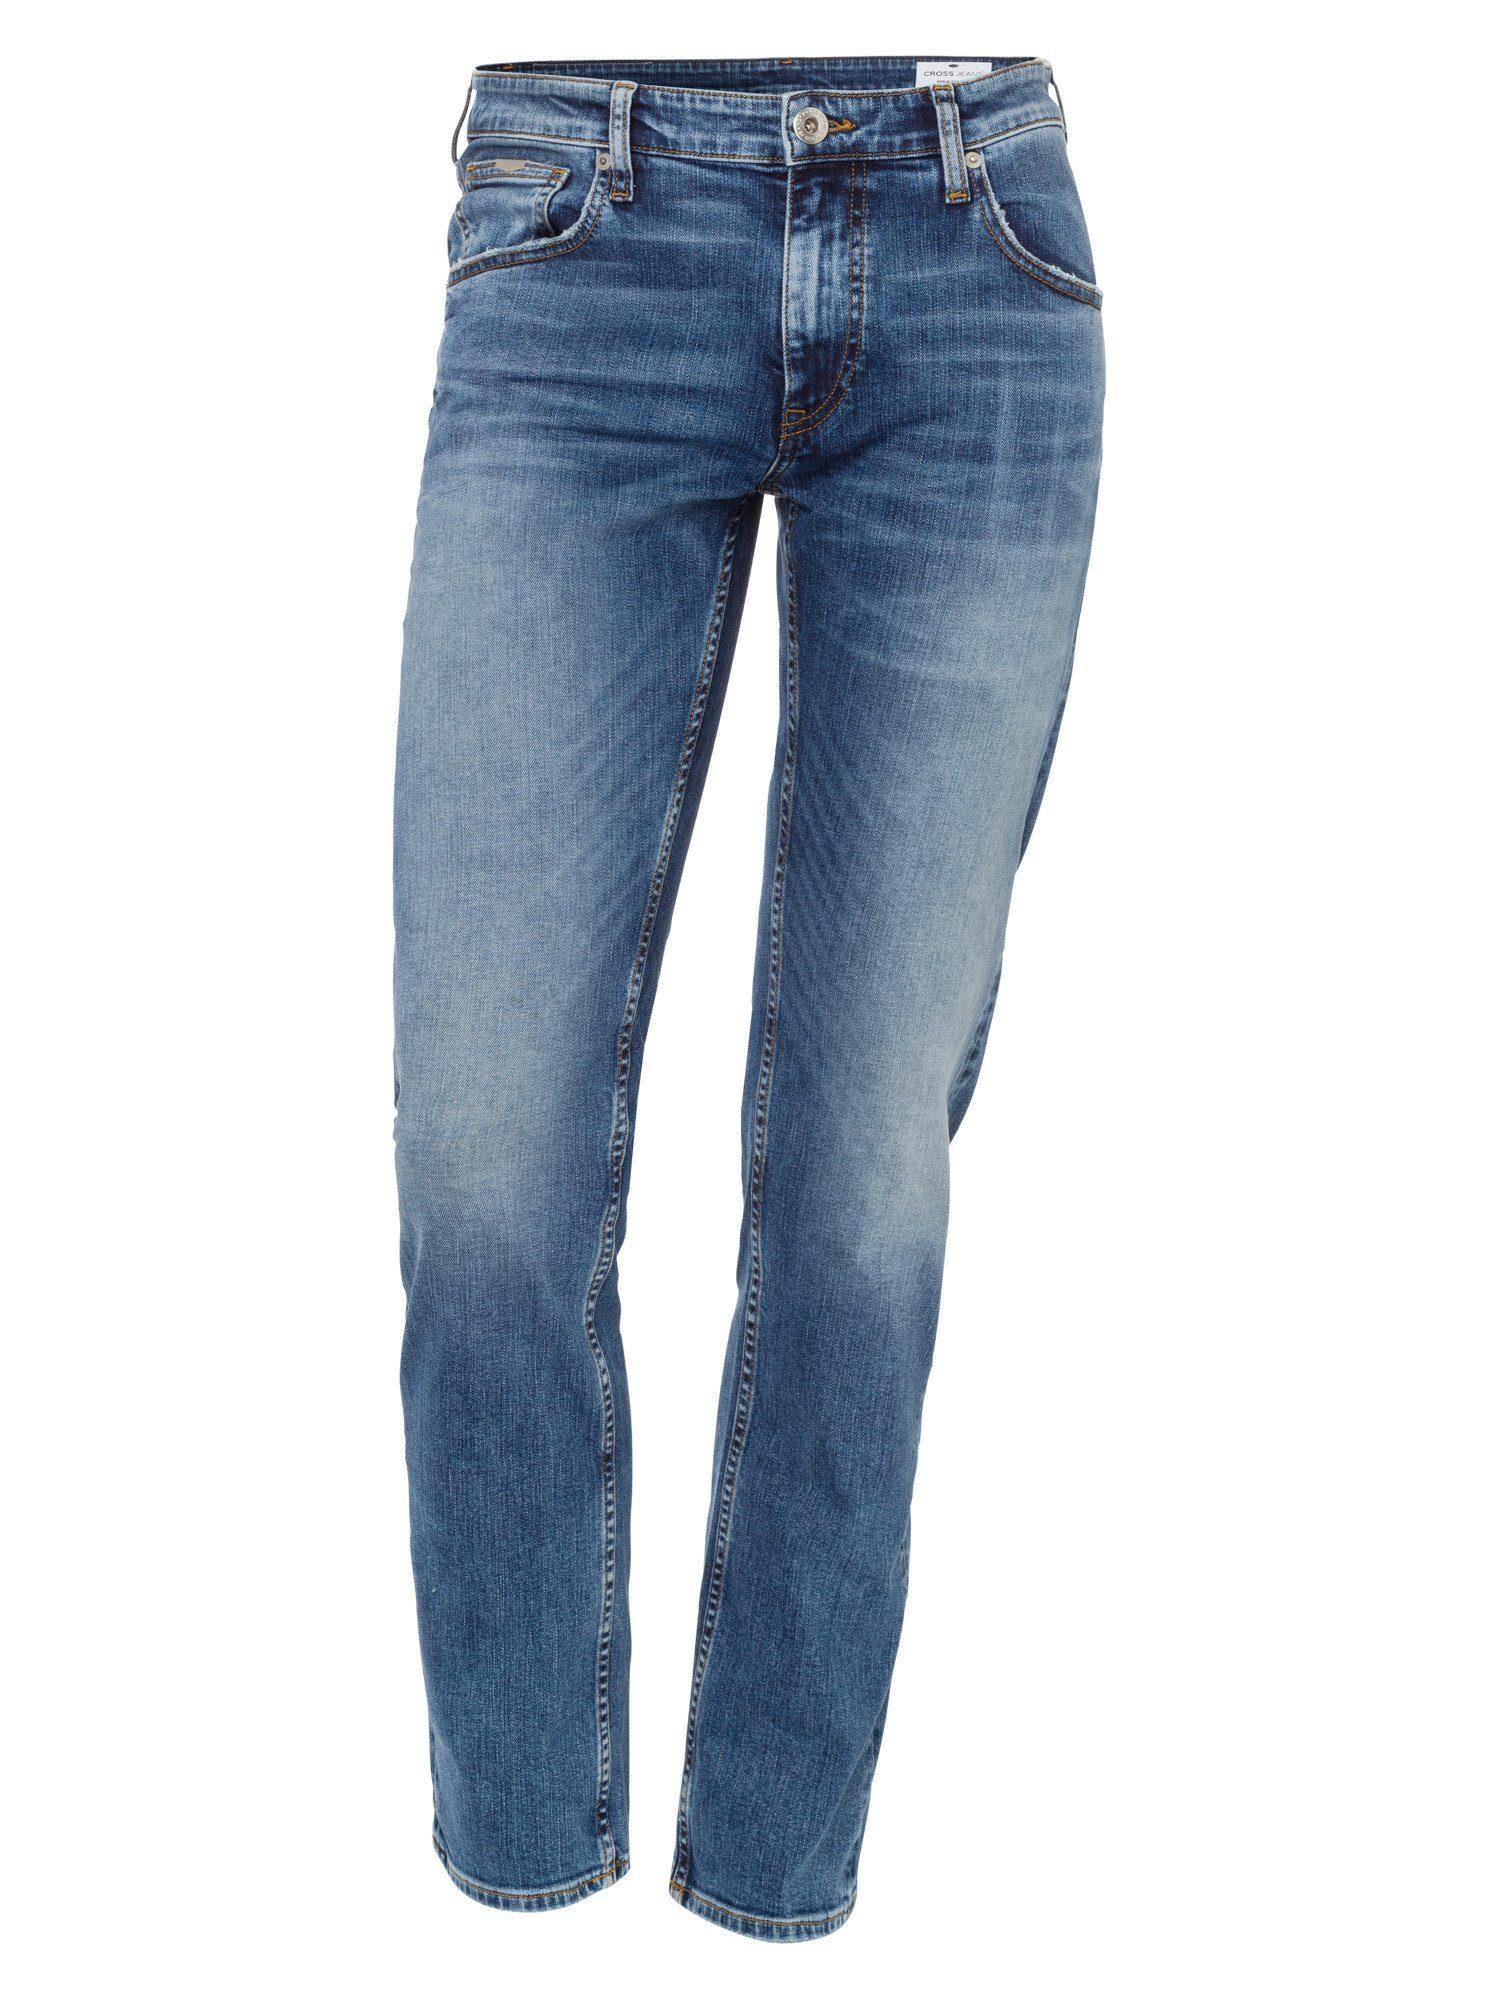 Cross Jeans® Slim Fit Jeans Damien In De Online Shop - Geweldige Prijs